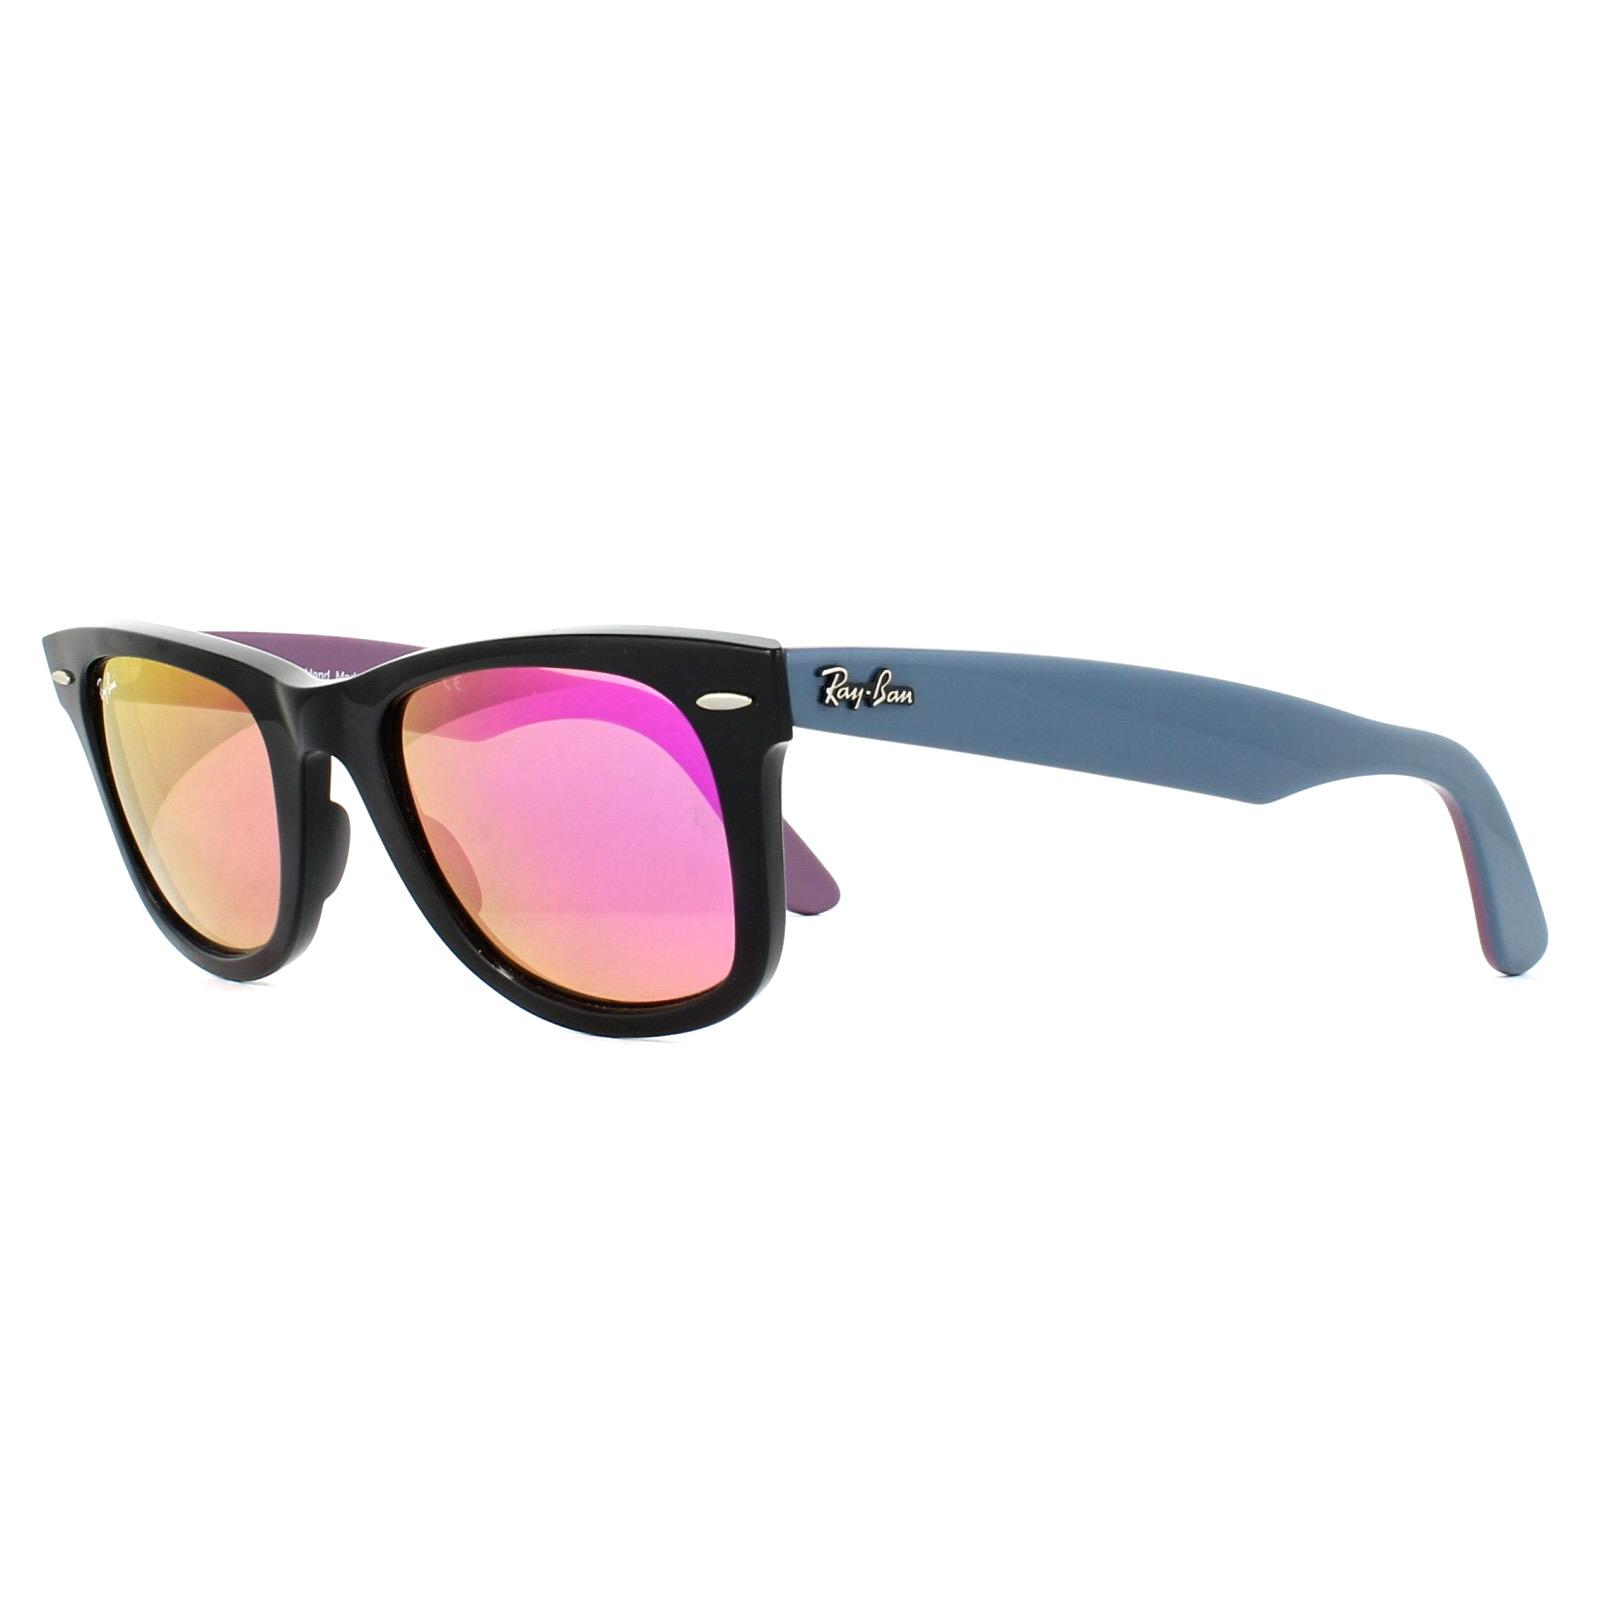 Details about Ray-Ban Sunglasses Wayfarer 2140 11744T Bicolor Black Blue    Violet Pink Mirror 470e2ada61dcd